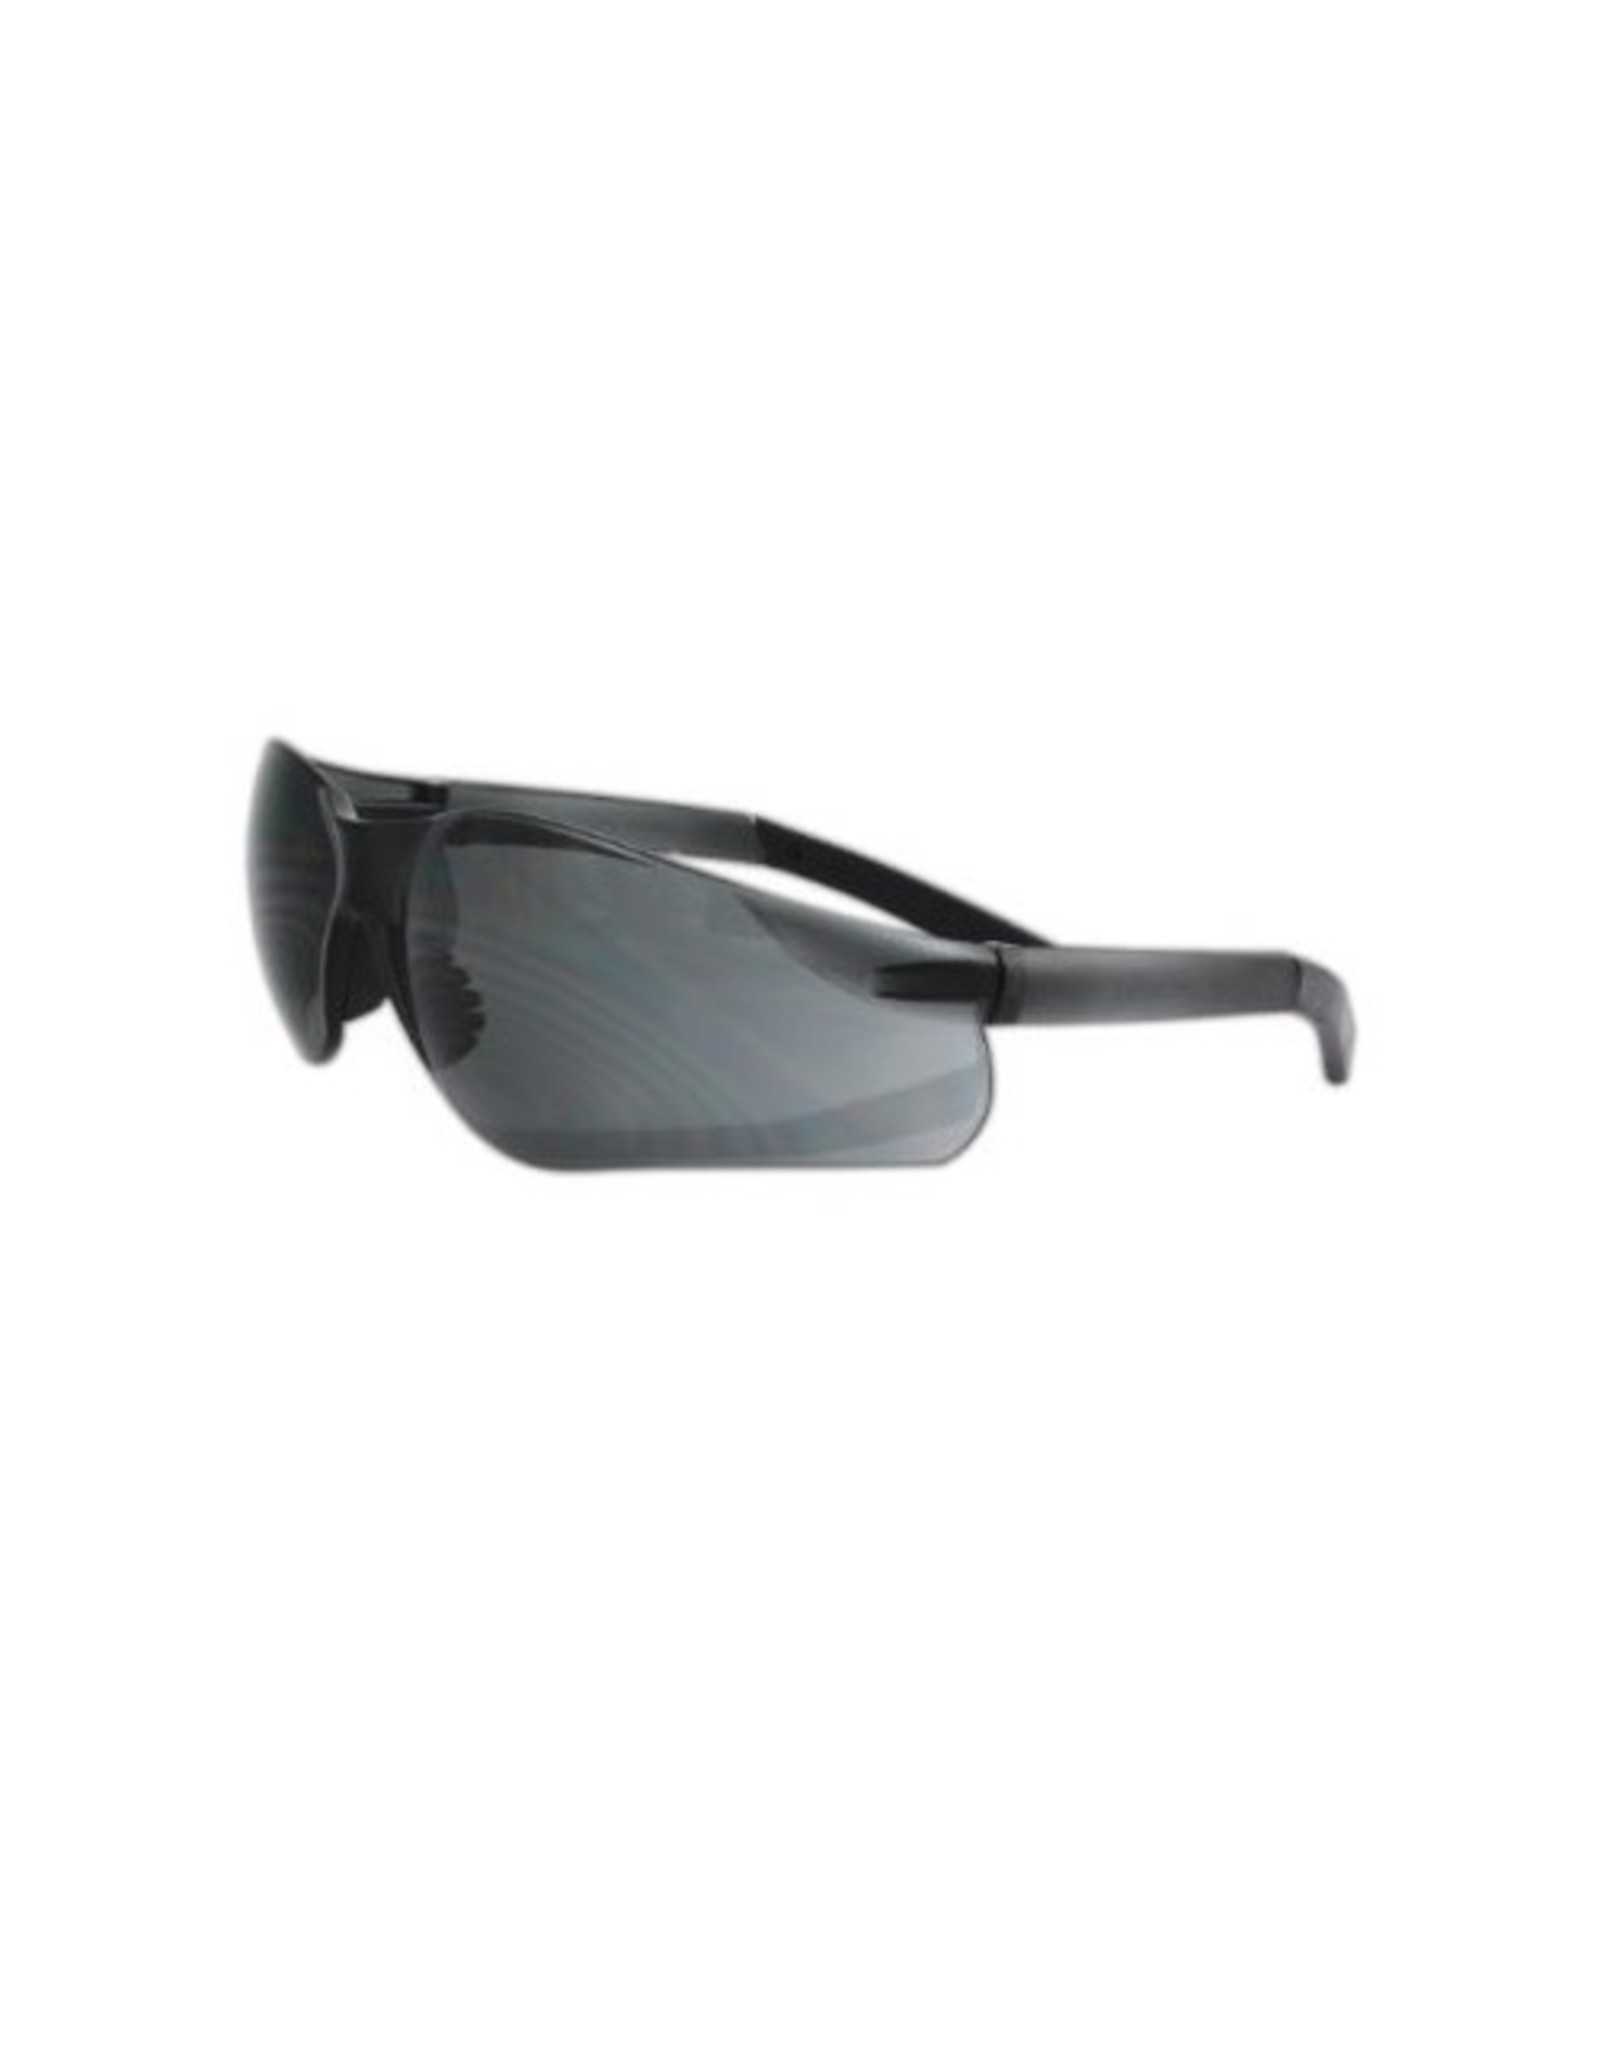 Magid Glove Magid Gemstone Myst Flex Y19 Protective Safety Glasses - Smoke